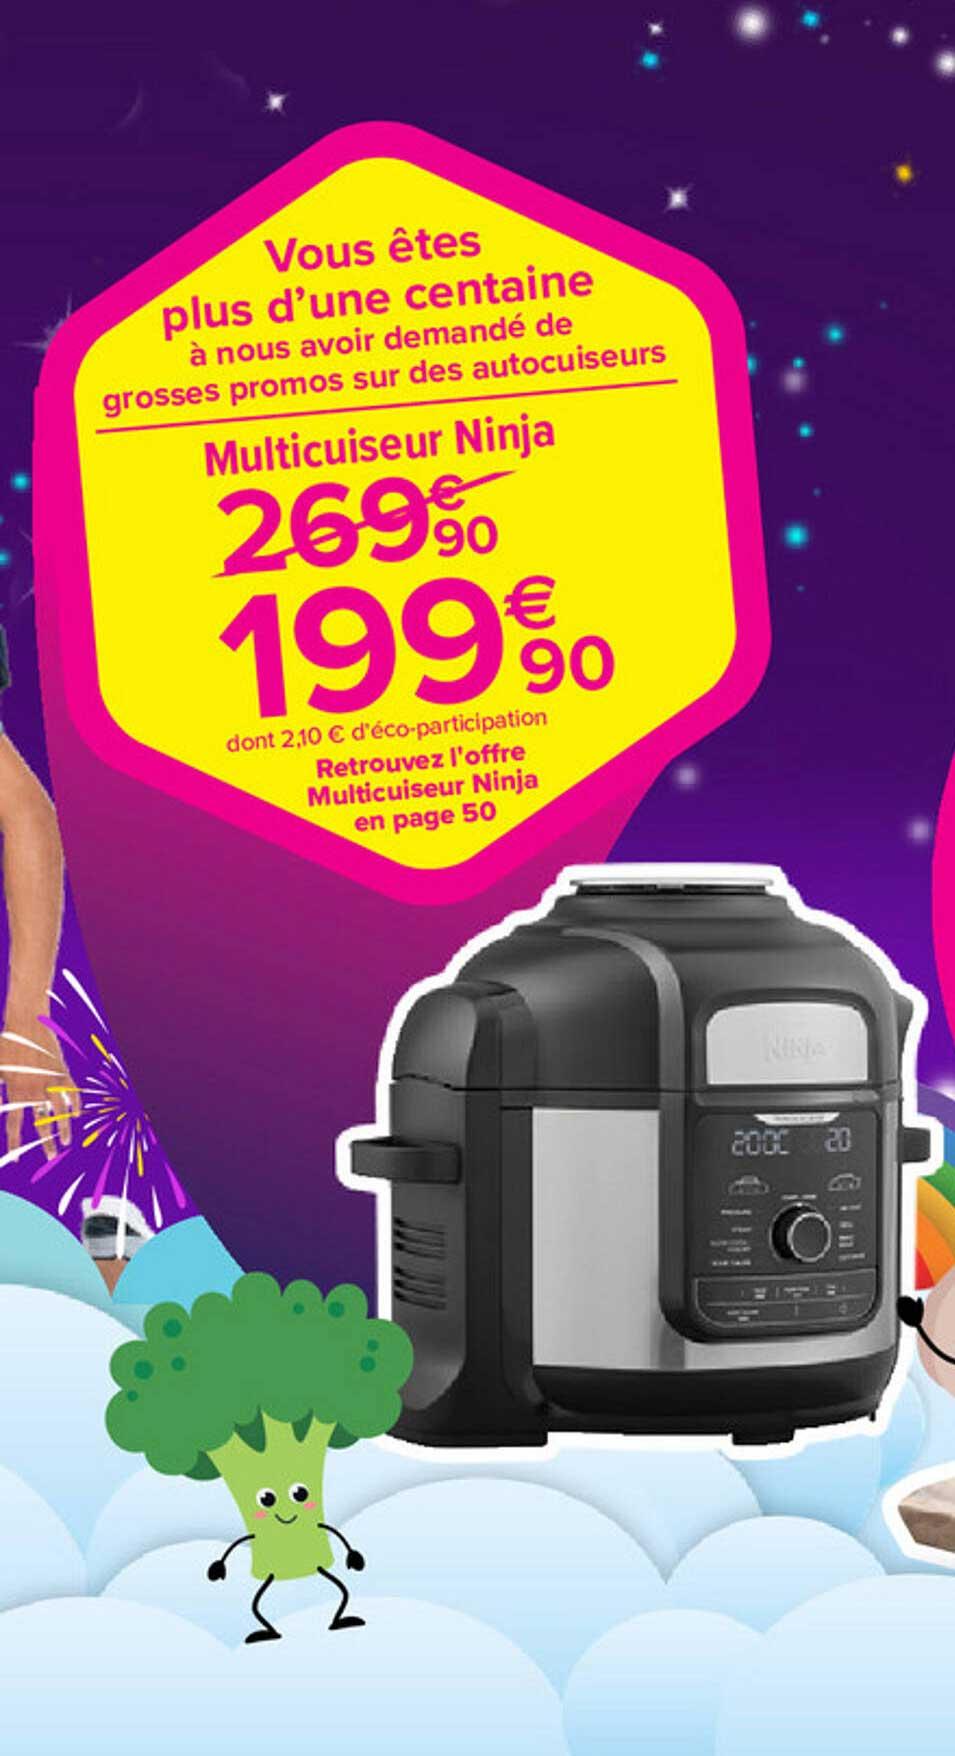 Carrefour Market Multicuiseur Ninja